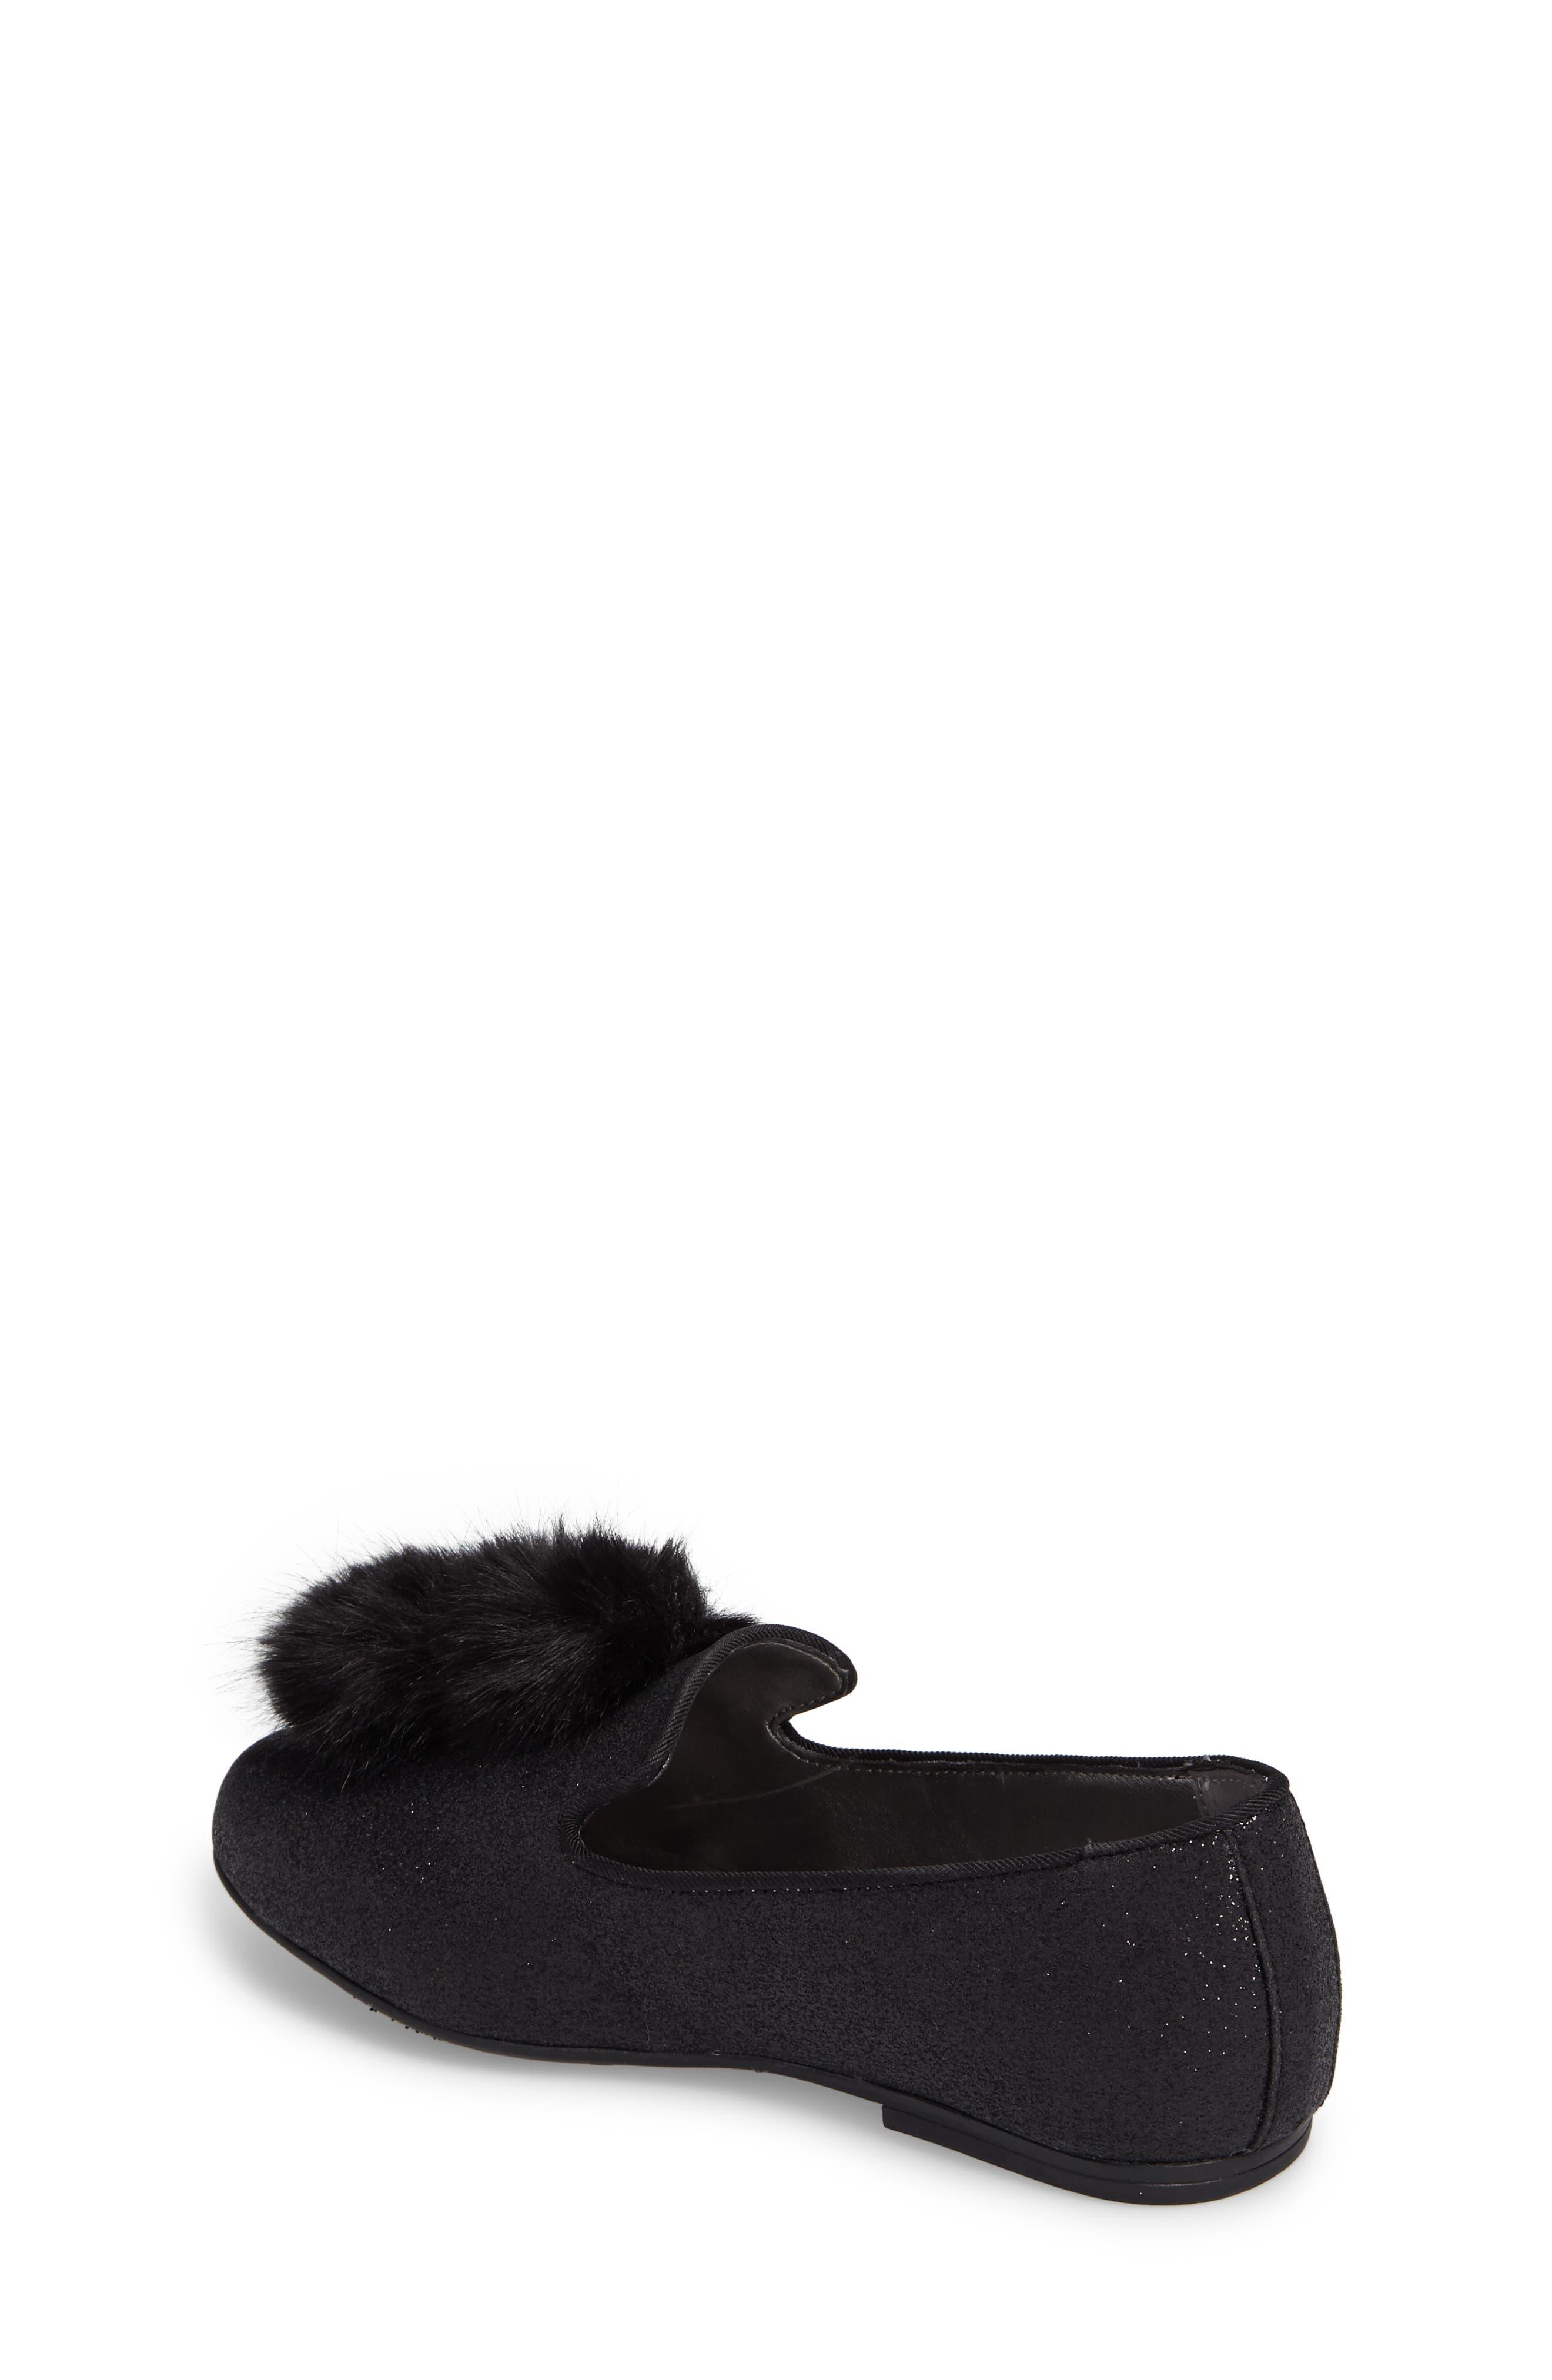 Caela Faux Fur Loafer,                             Alternate thumbnail 2, color,                             001